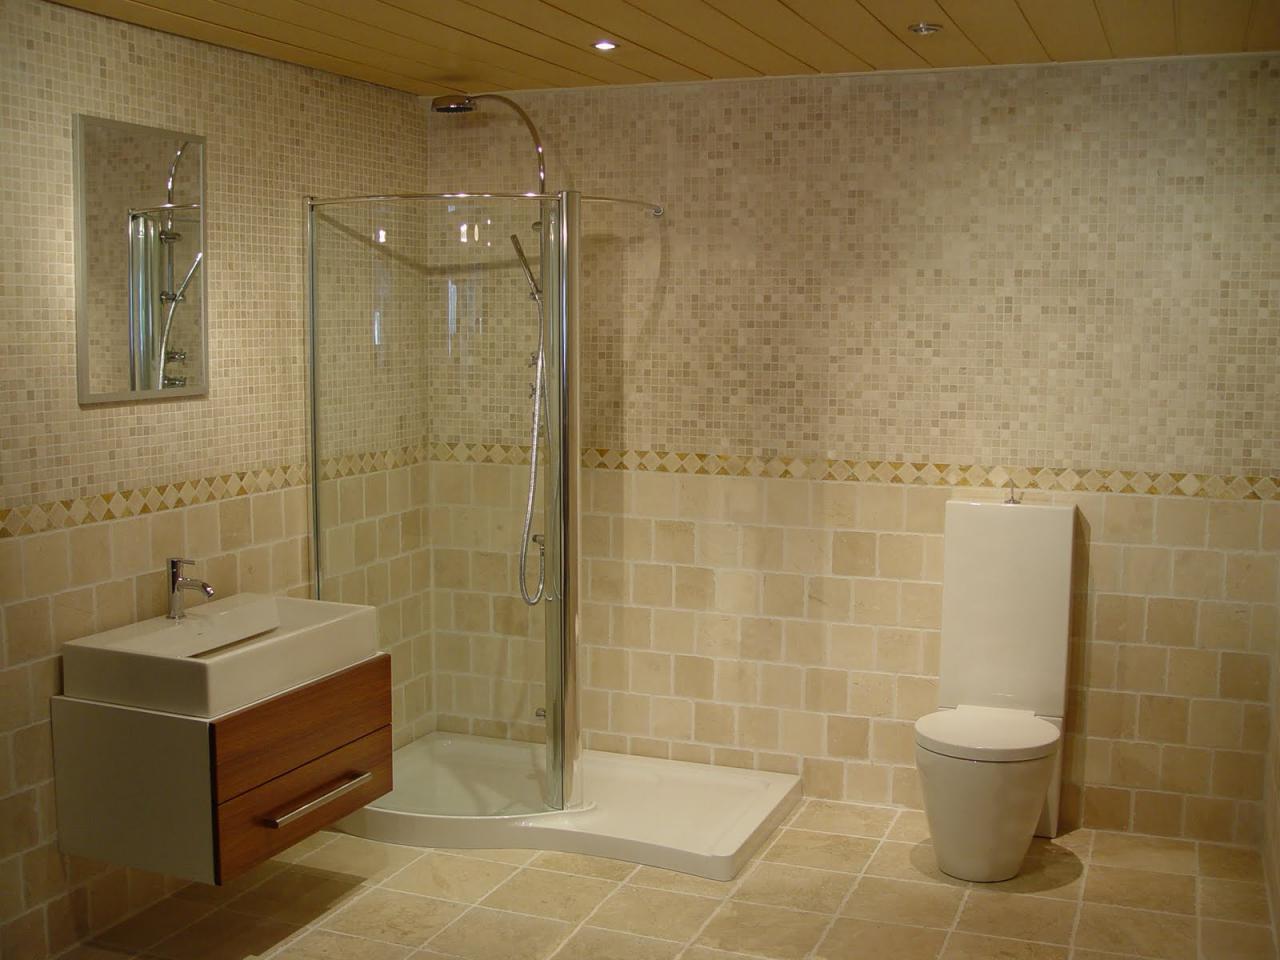 Bathroom%2bWall%2bTiles%2bIdeas-Bathroom-Tile-Ideas.jpg